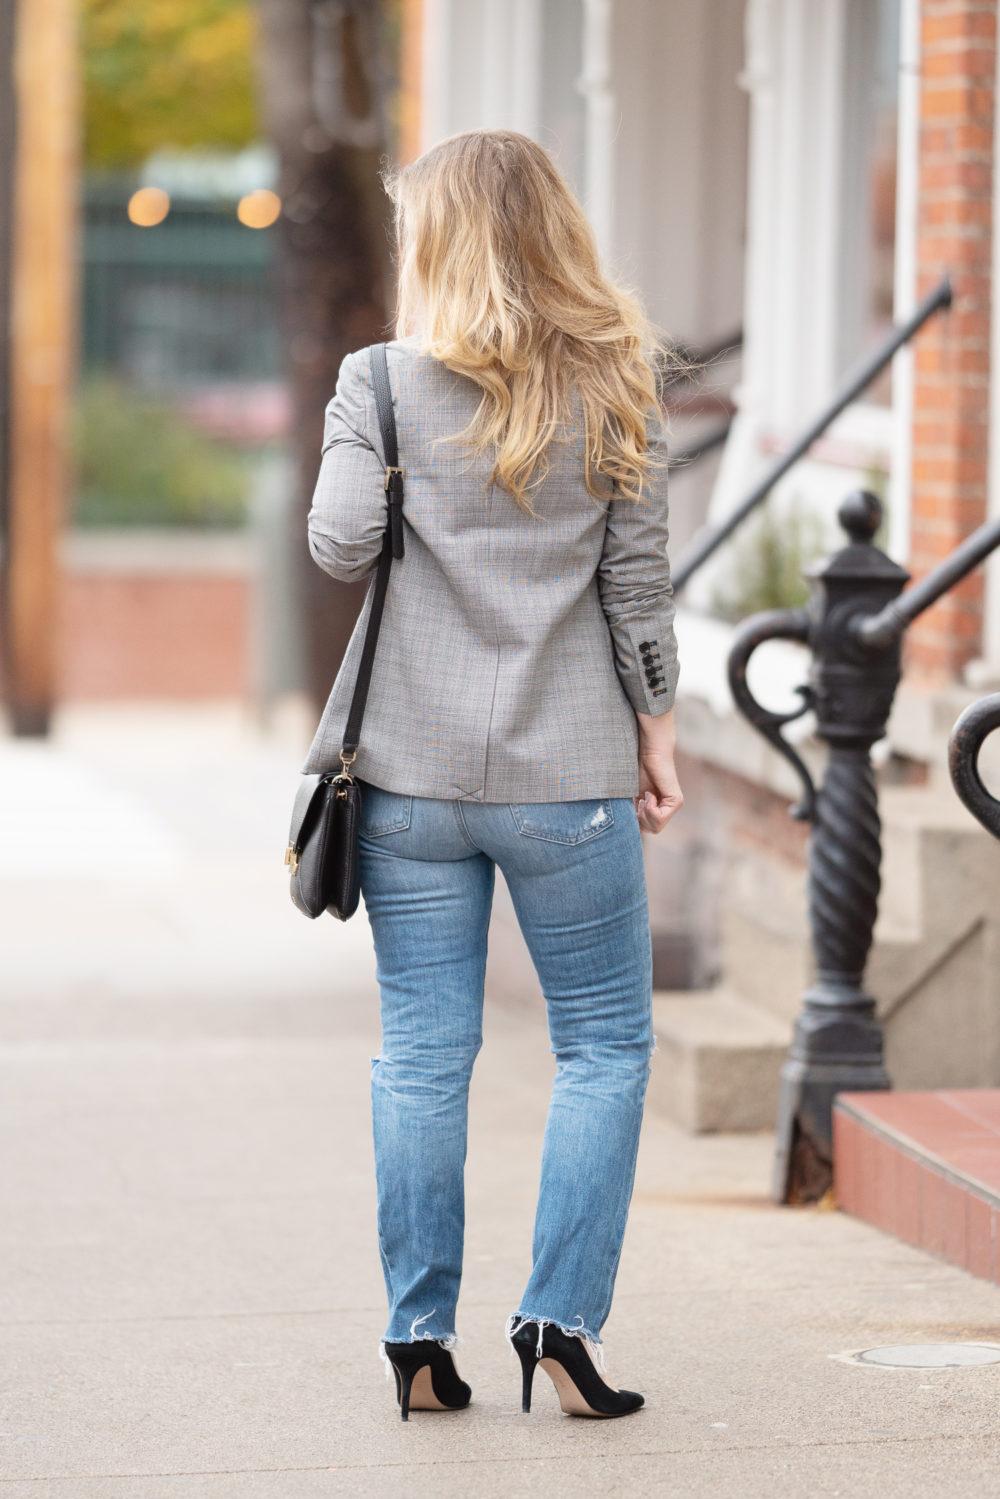 Petite Fashion Blog | Petite Style | 1.State Glen Plaid Blazer | J. Crew Factory Scalloped Cami | AG Isabelle Straight Leg Jeans | Demeiller Mini Berling Bag